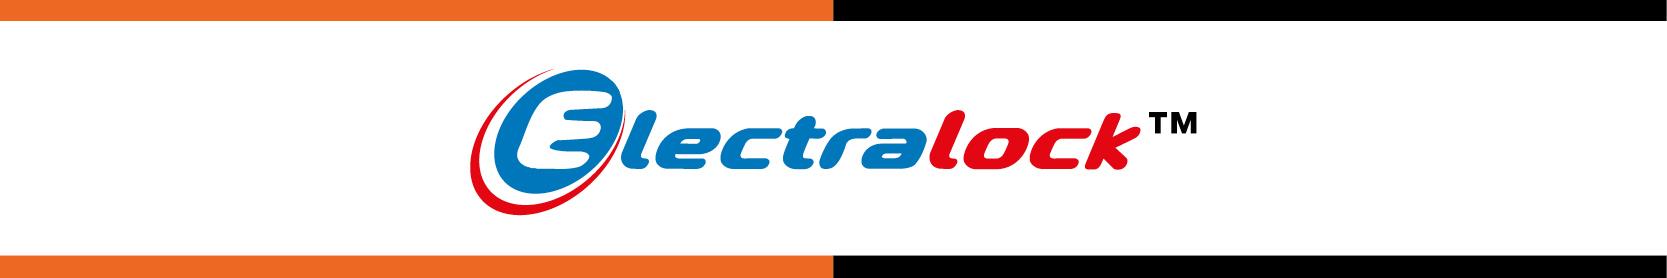 Electralock™